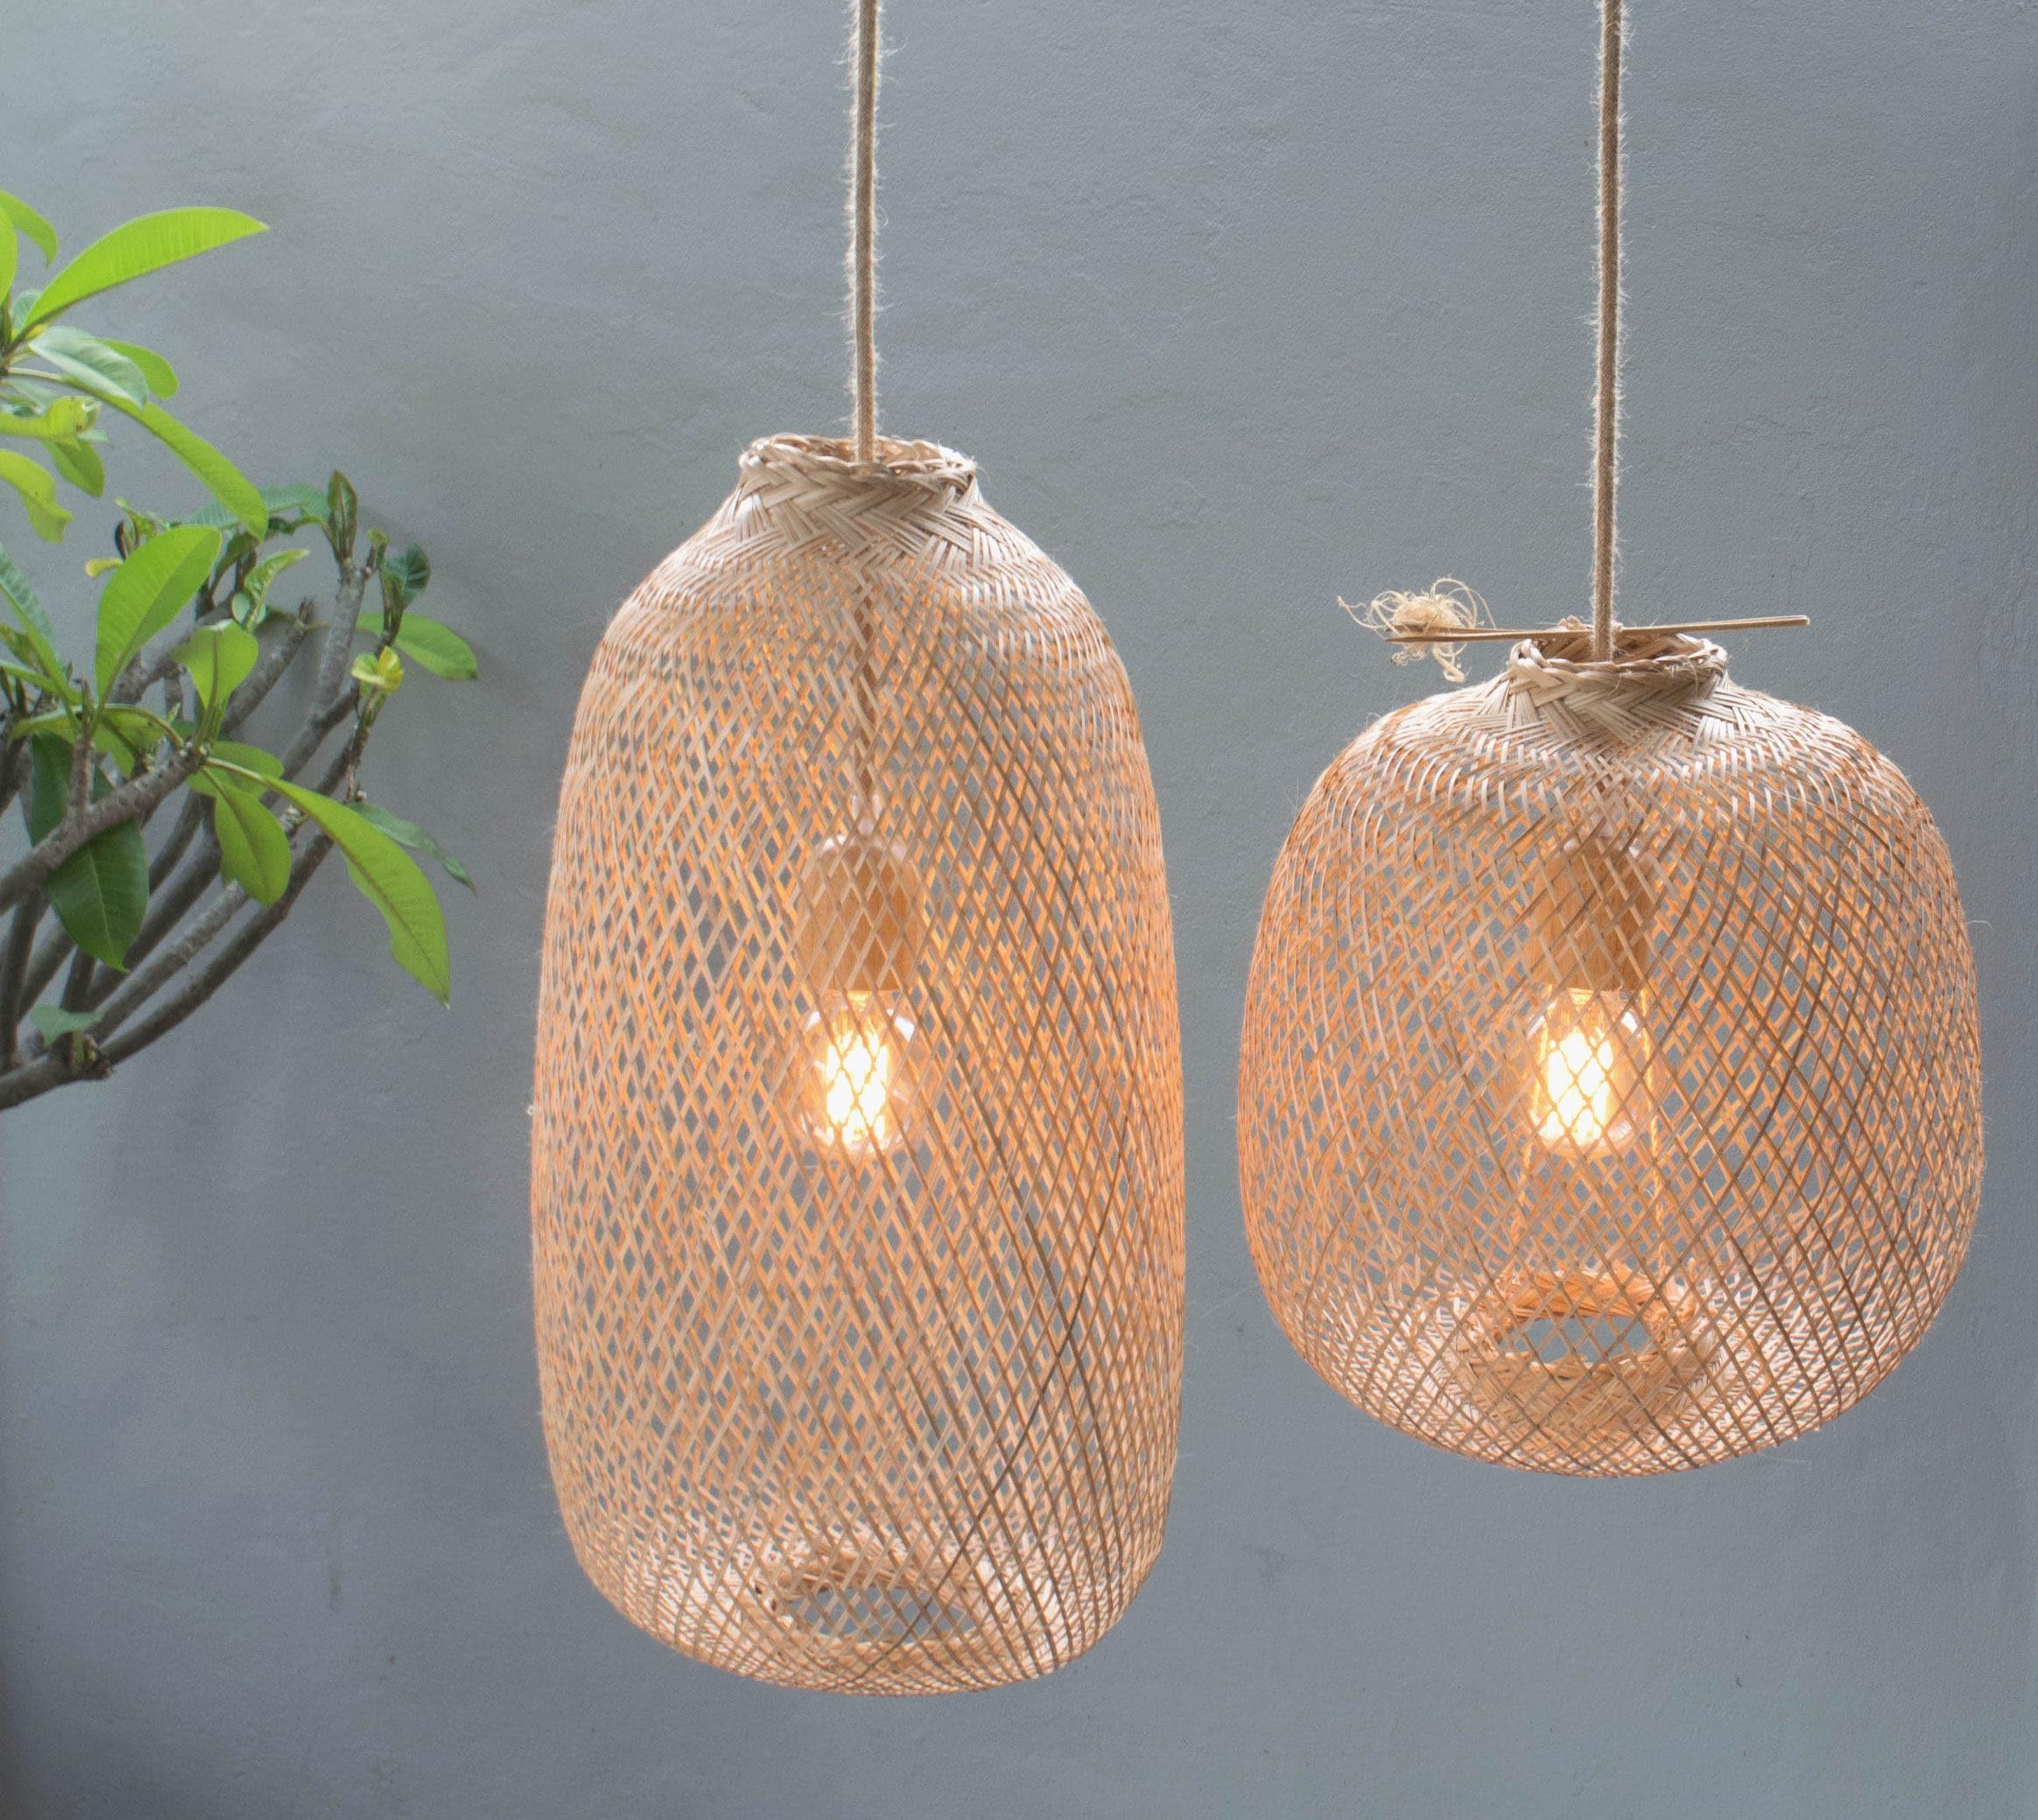 Bamboo Pendant Light Handmade Wooden Pendant Lamp Hanging